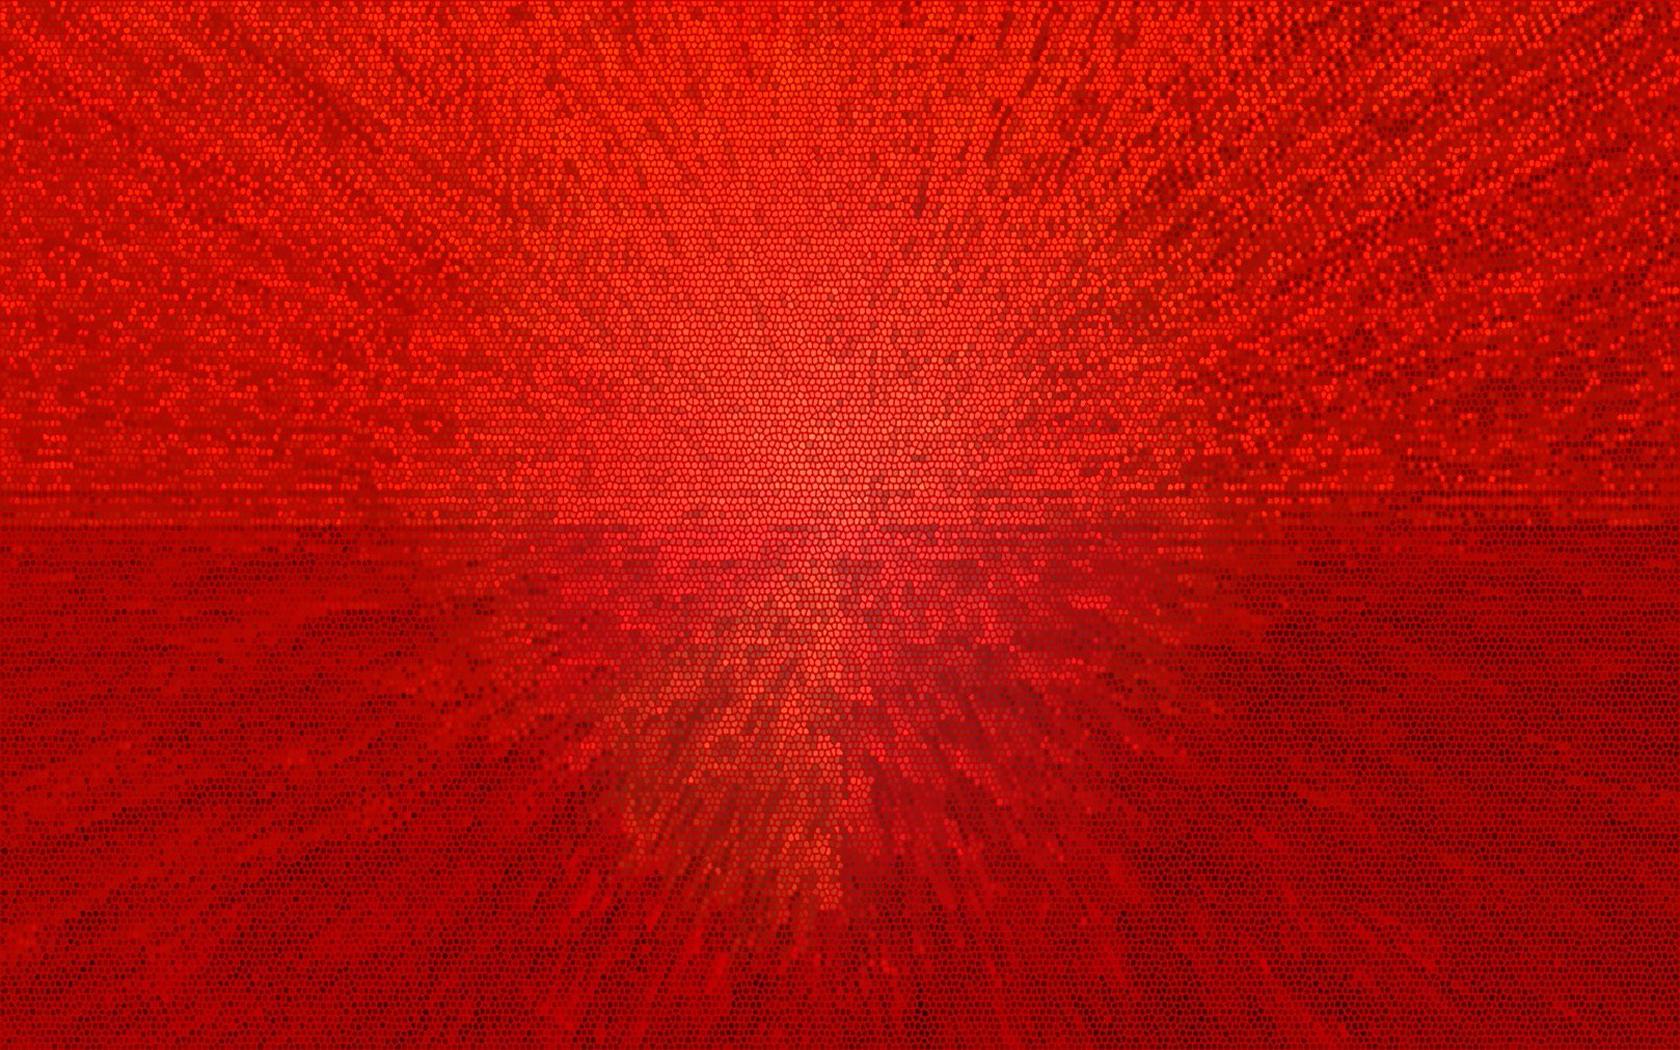 1680x1050 Red Energy desktop PC and Mac wallpaper 1680x1050